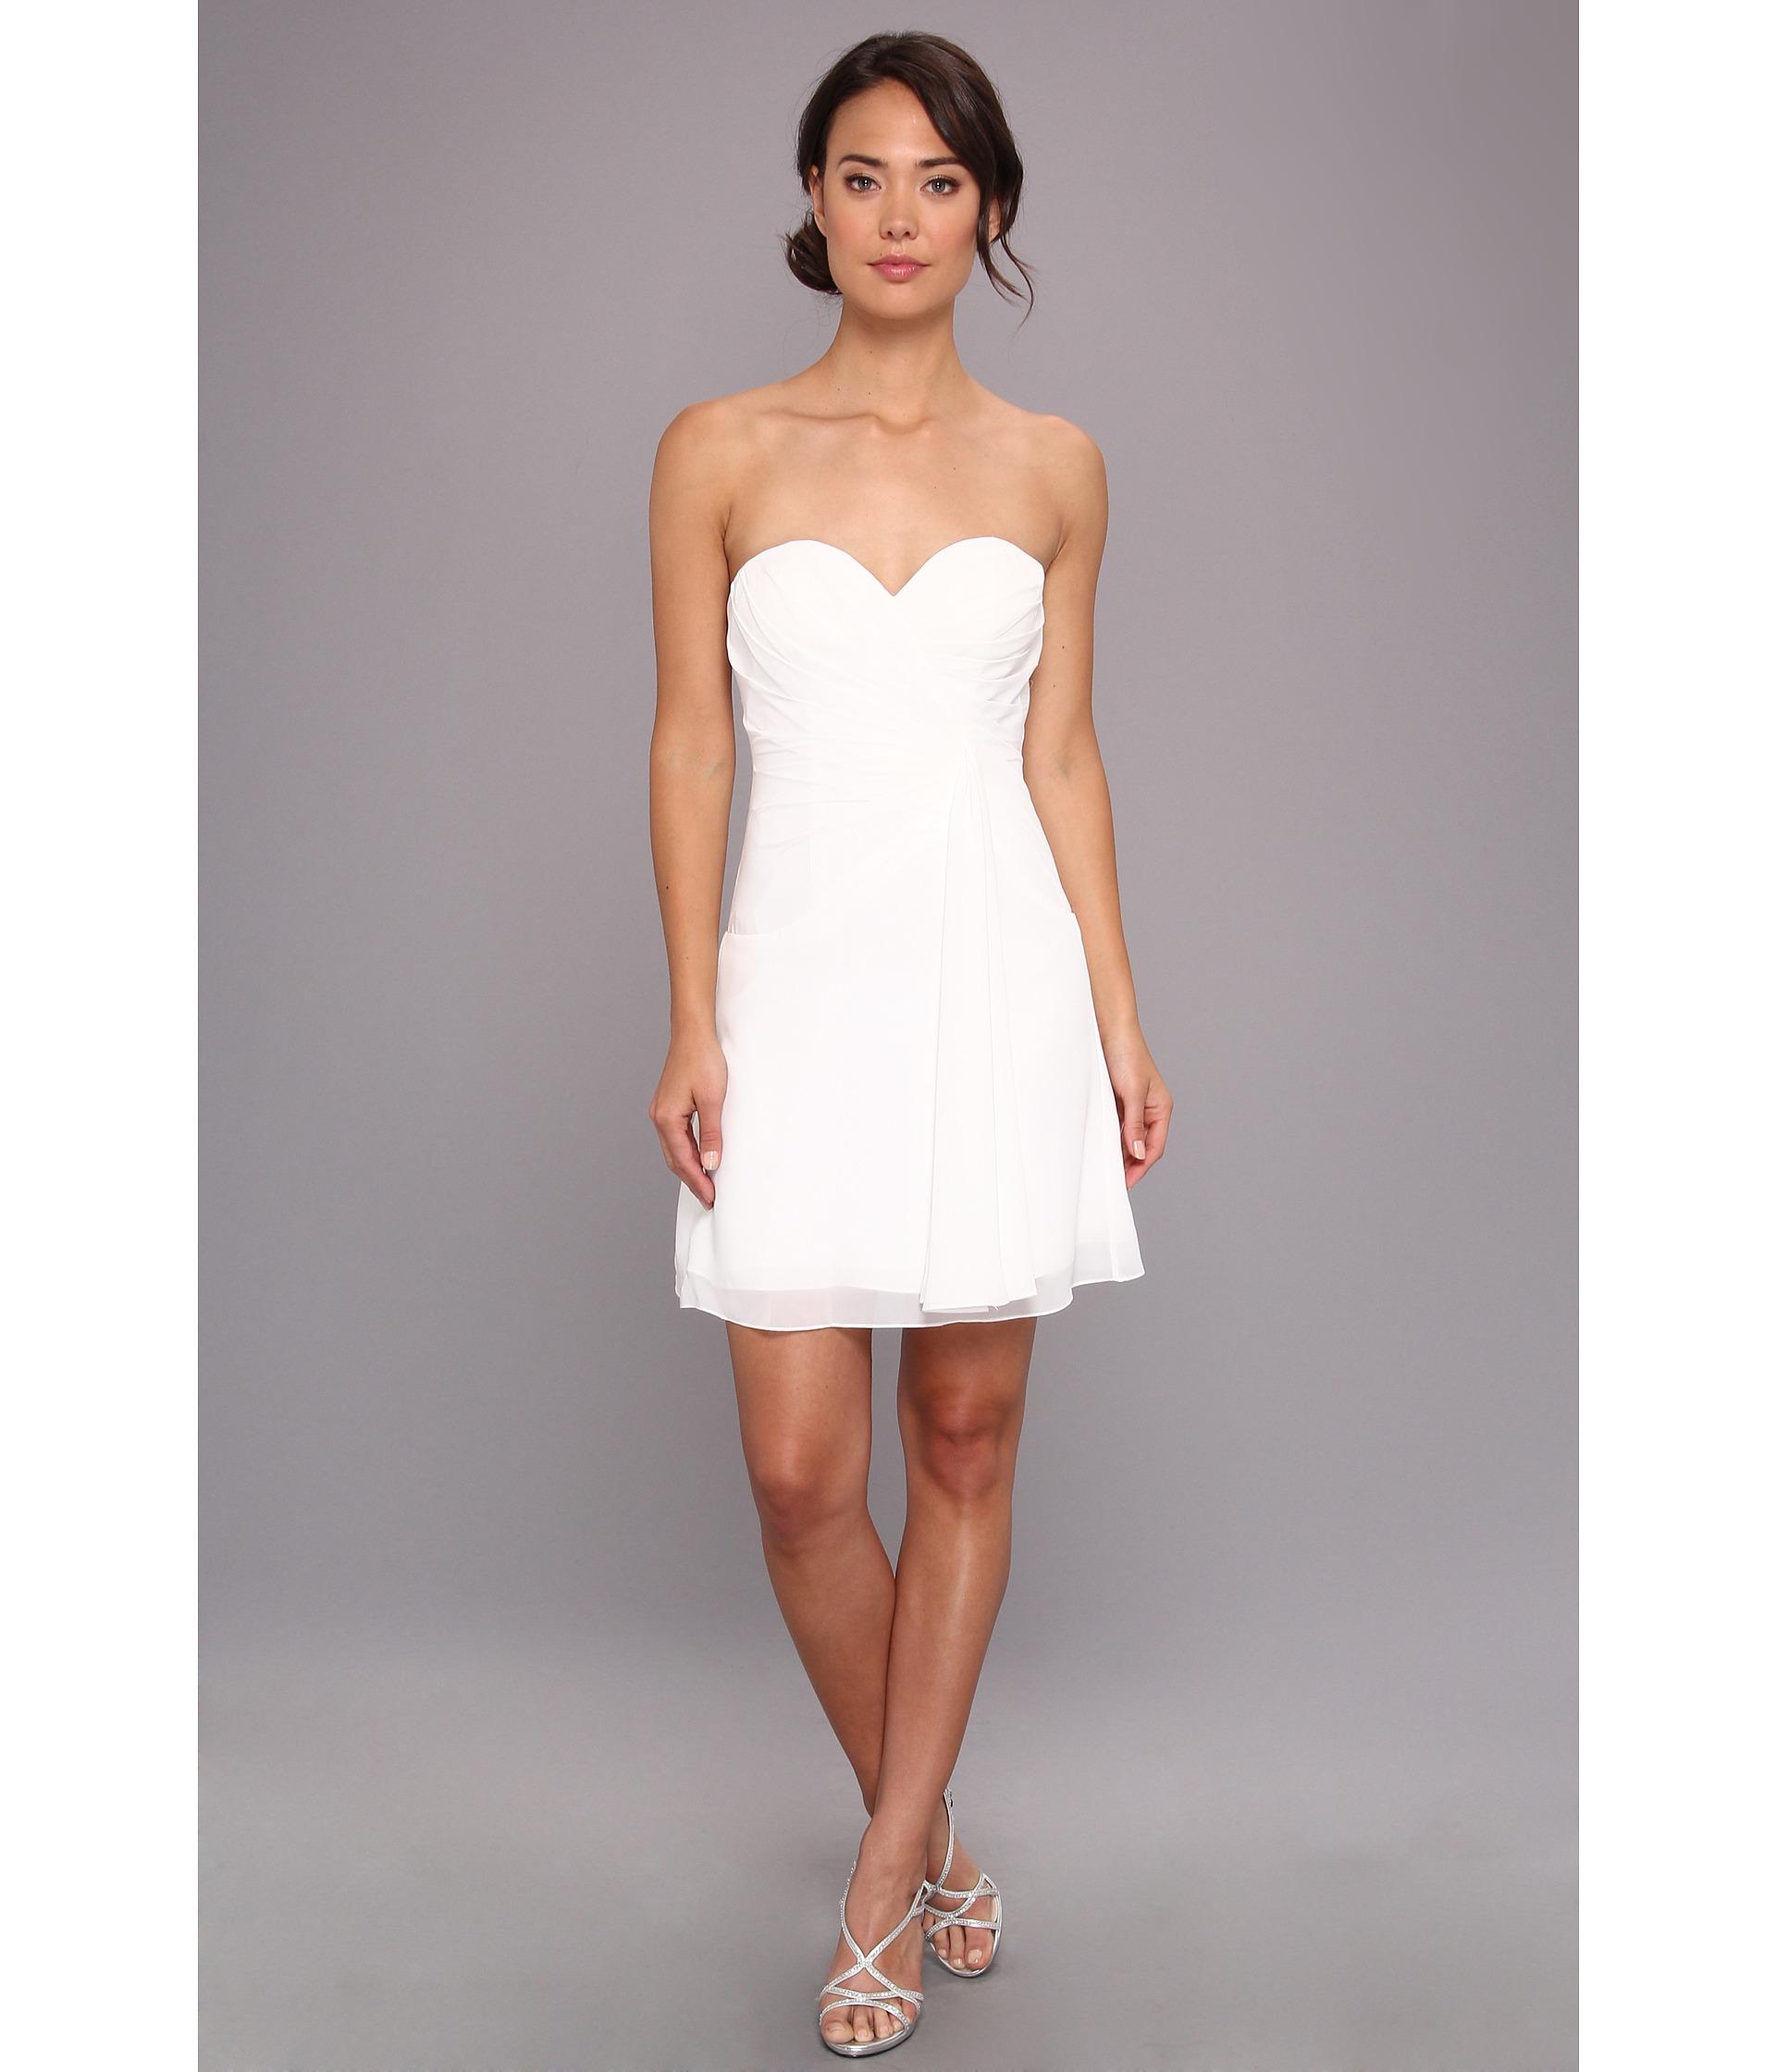 Faviana Short Strapless Sweetheart Dress 7075A - 6pm.com